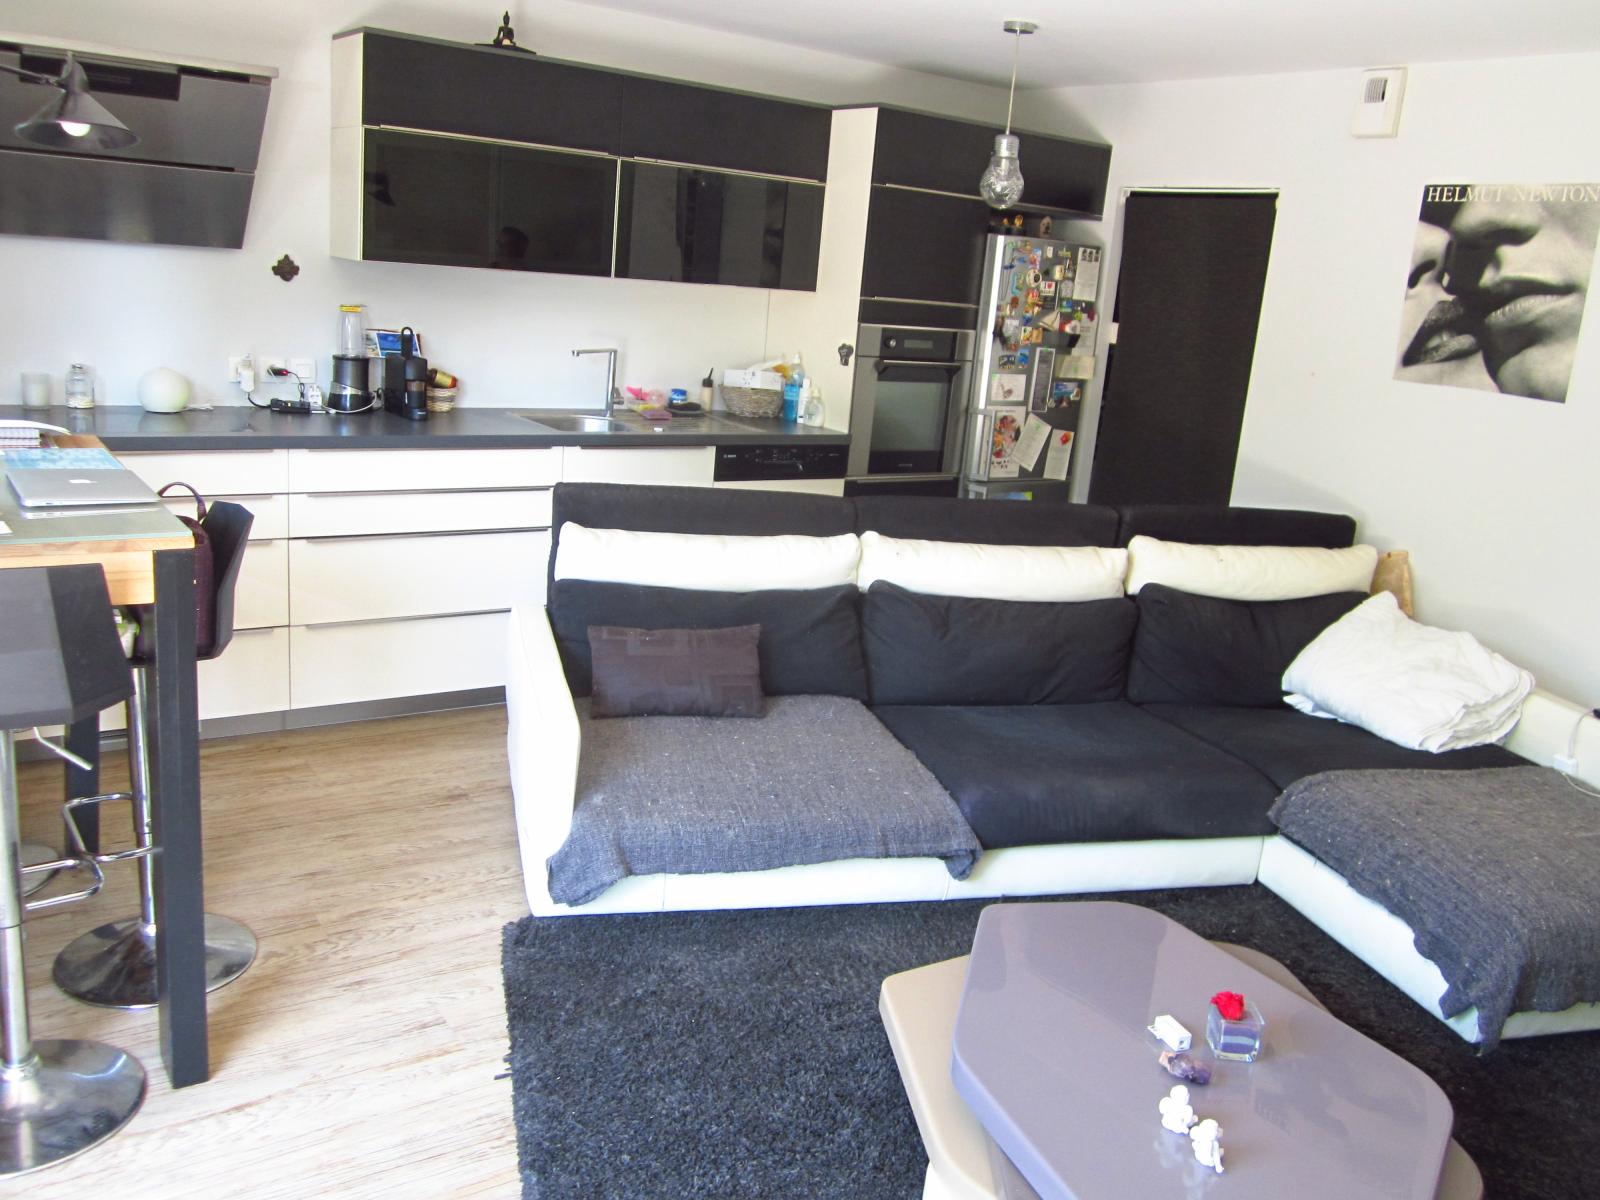 EXCLUSIVITE Valleiry Appartement T2 Coup de Coeur...Trop Mignon !